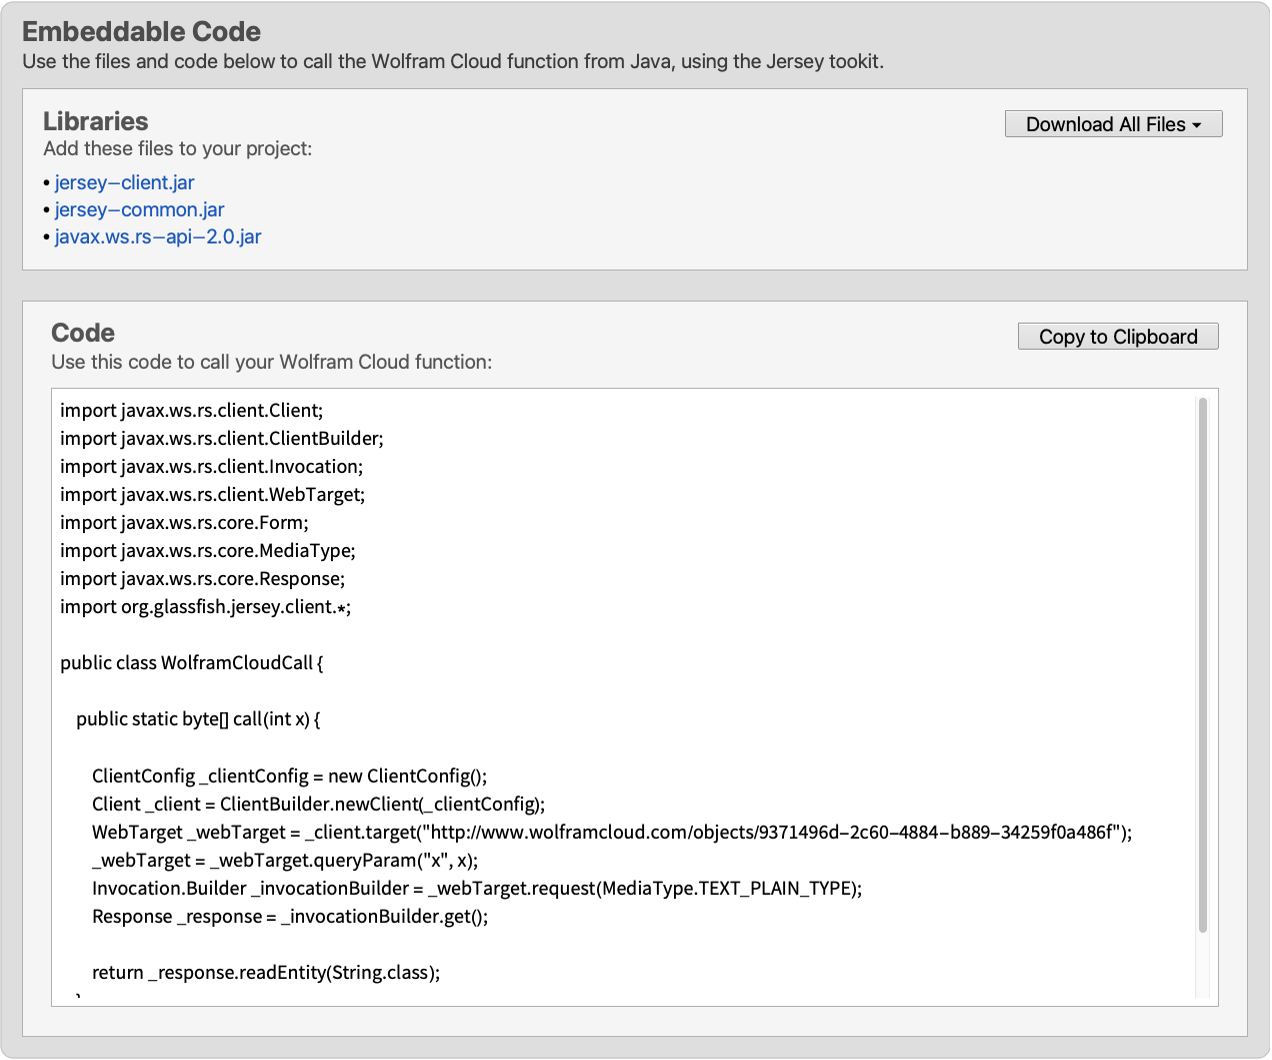 Java-Jersey—Wolfram Language Documentation